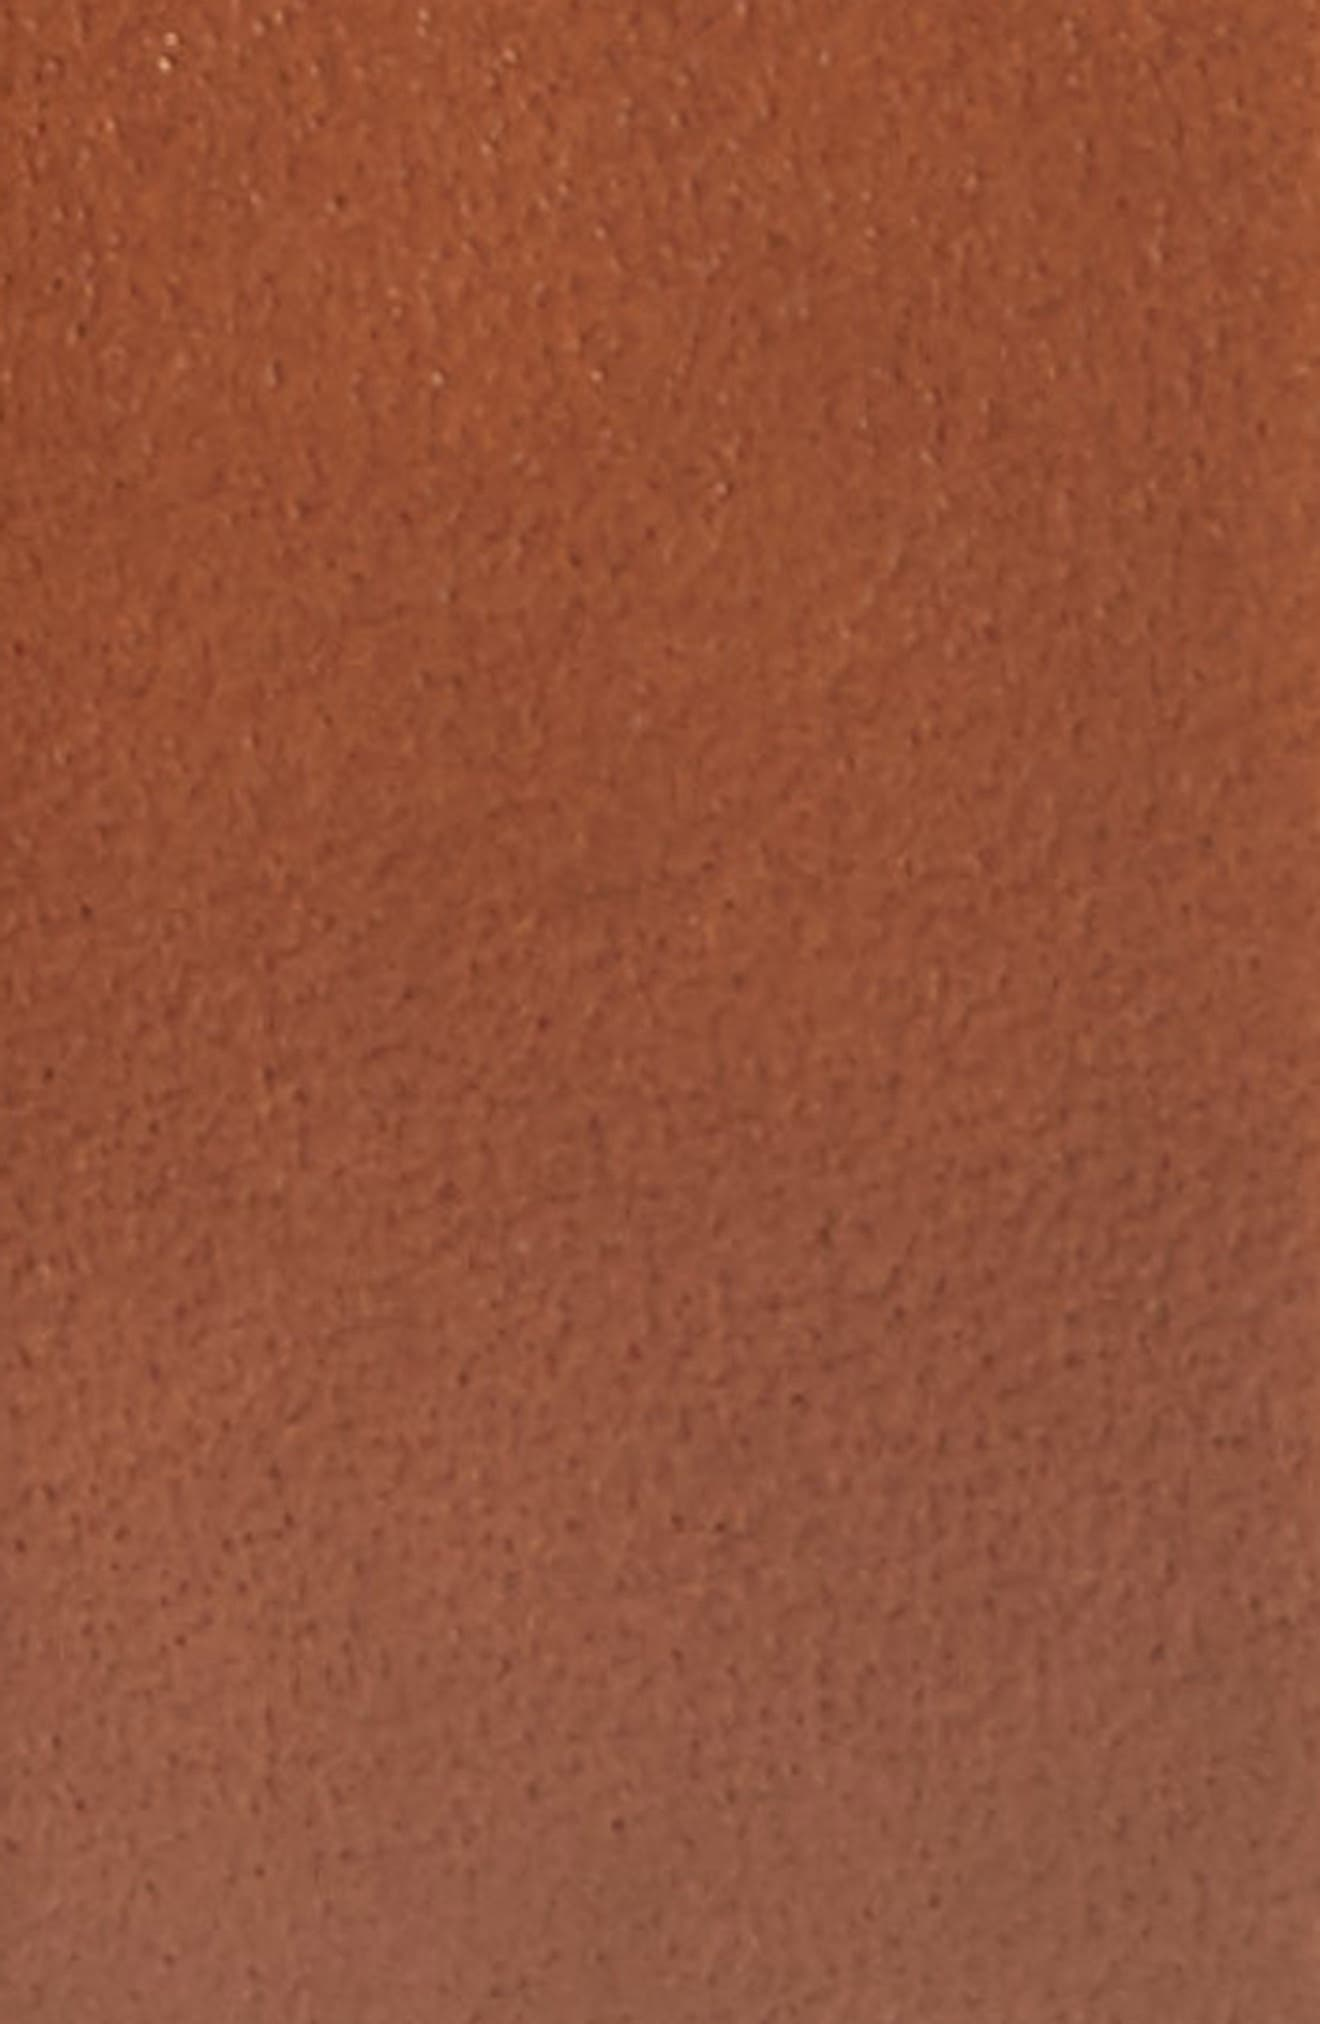 Carmelo Leather Dress Belt,                             Alternate thumbnail 2, color,                             Tan